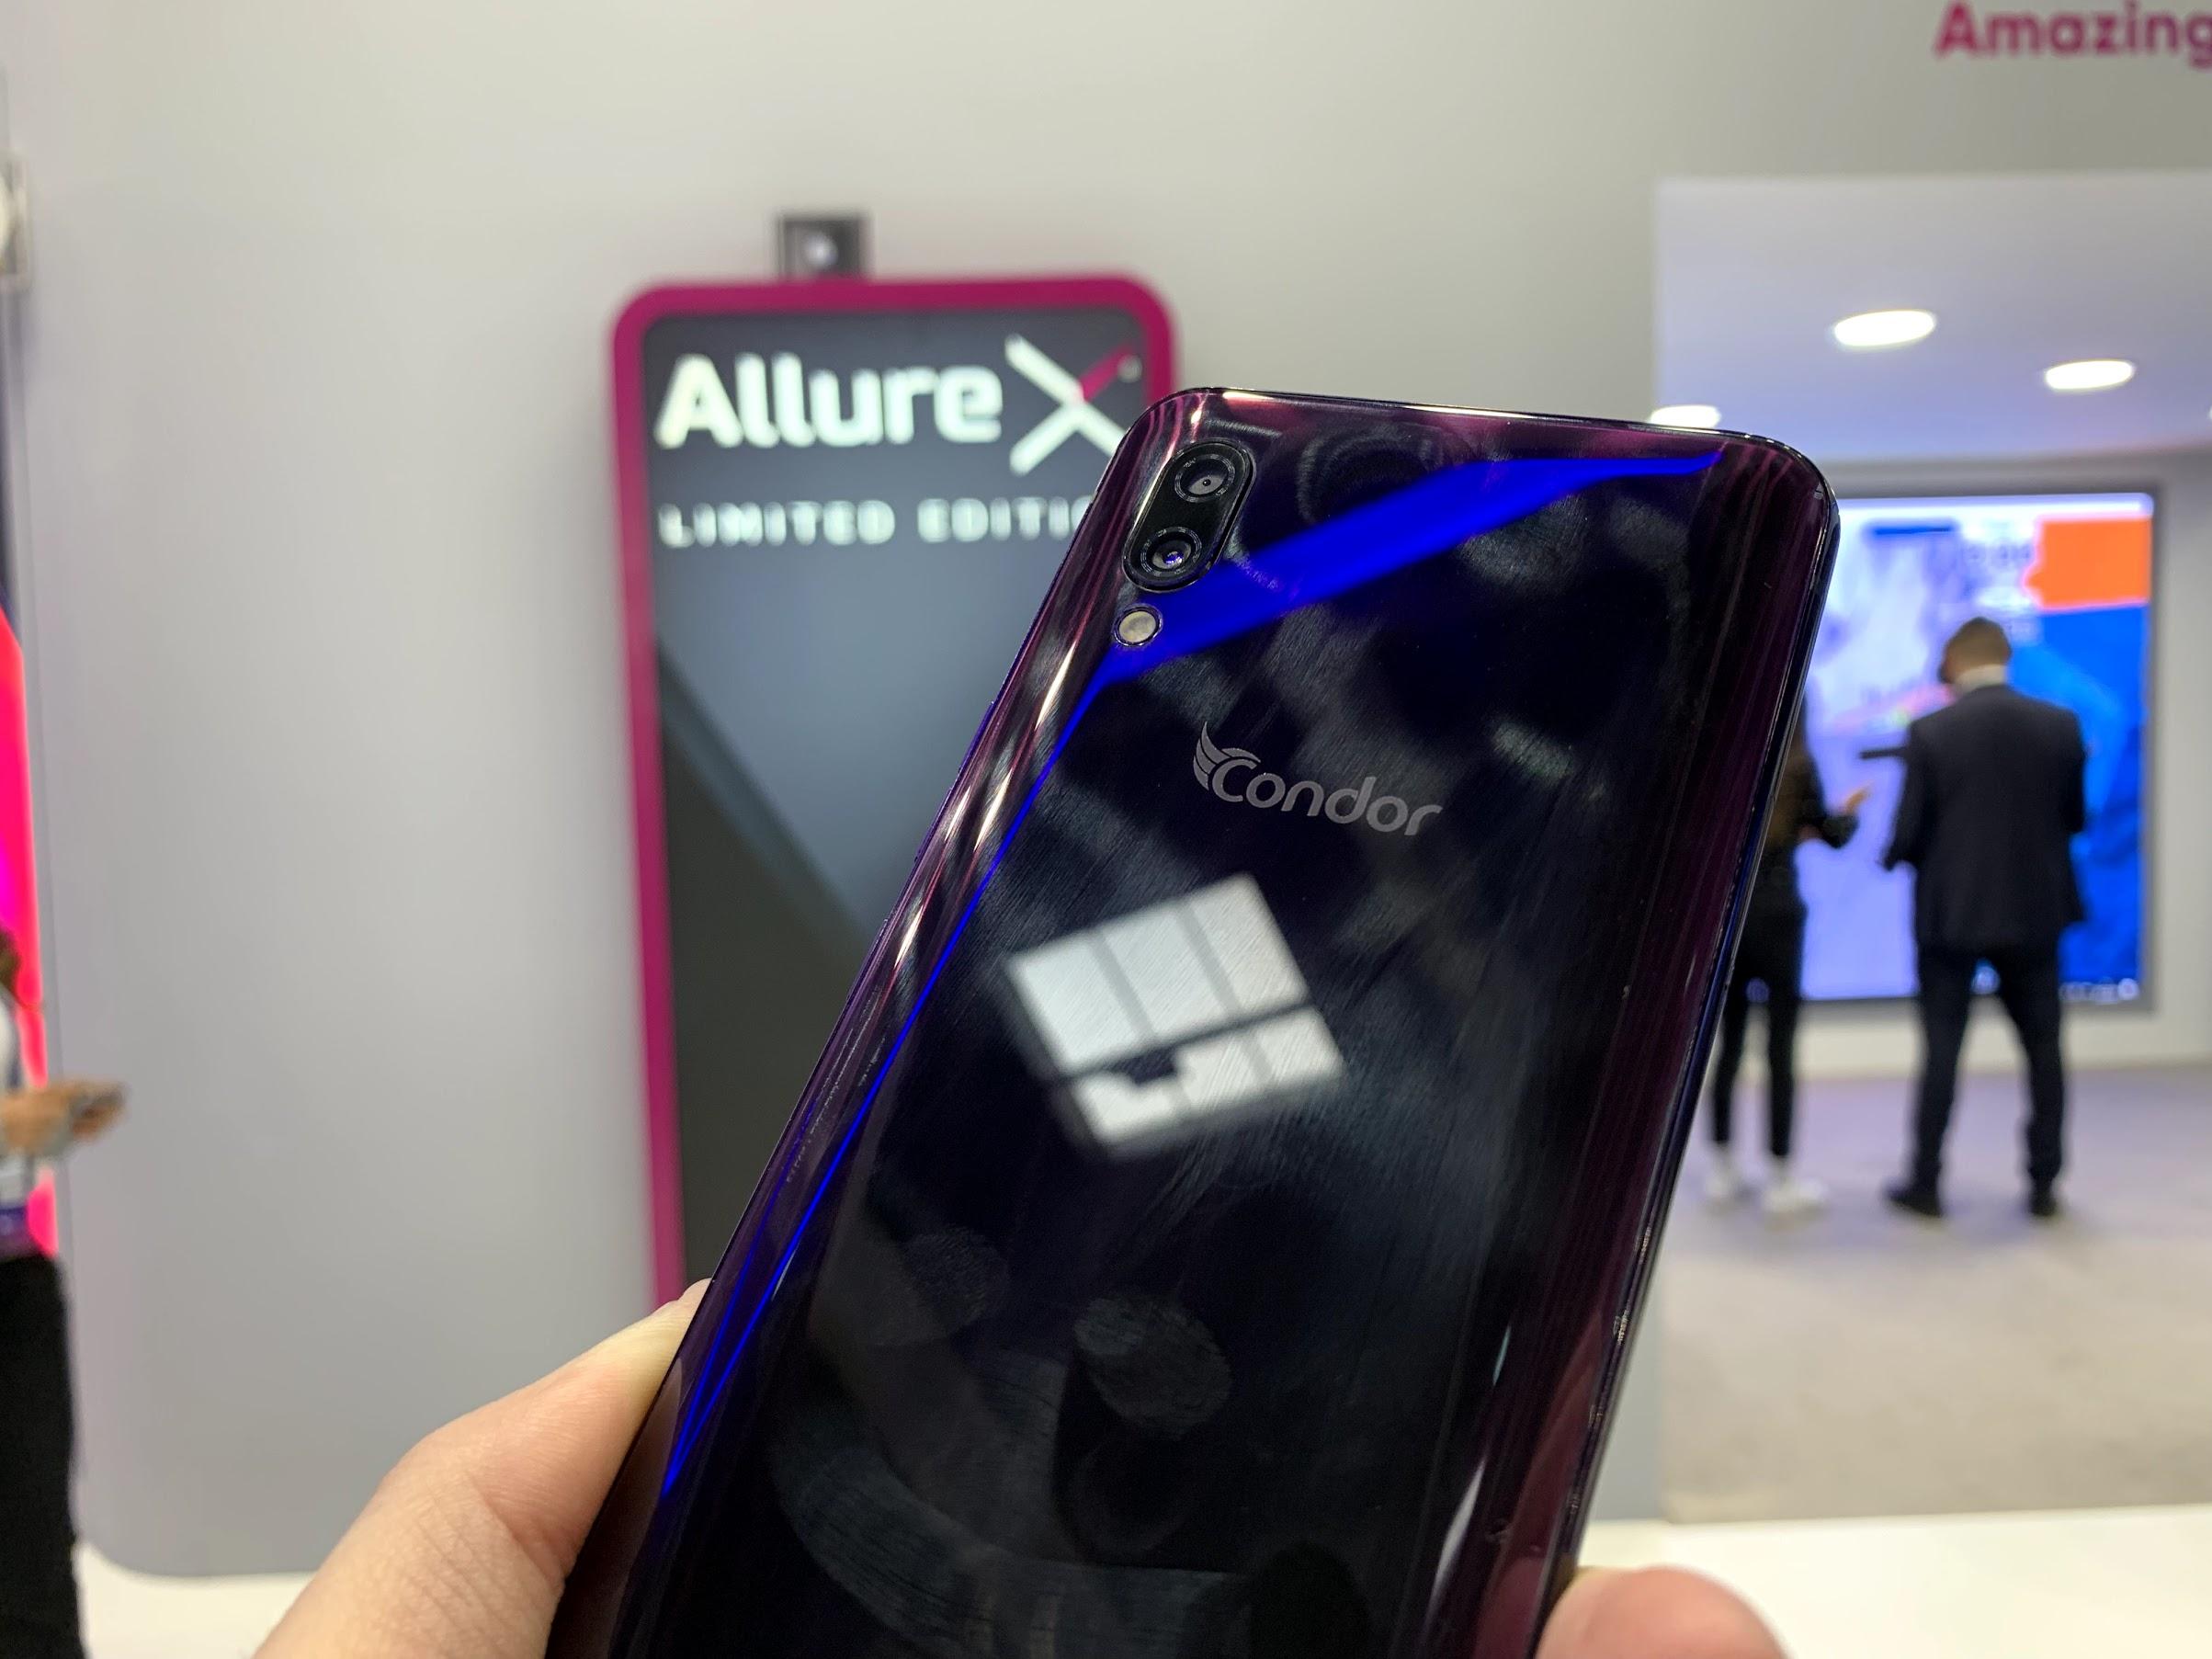 Prise En Main Du Condor Allure X Au Mwc 2019 Un Smartphone Qui A